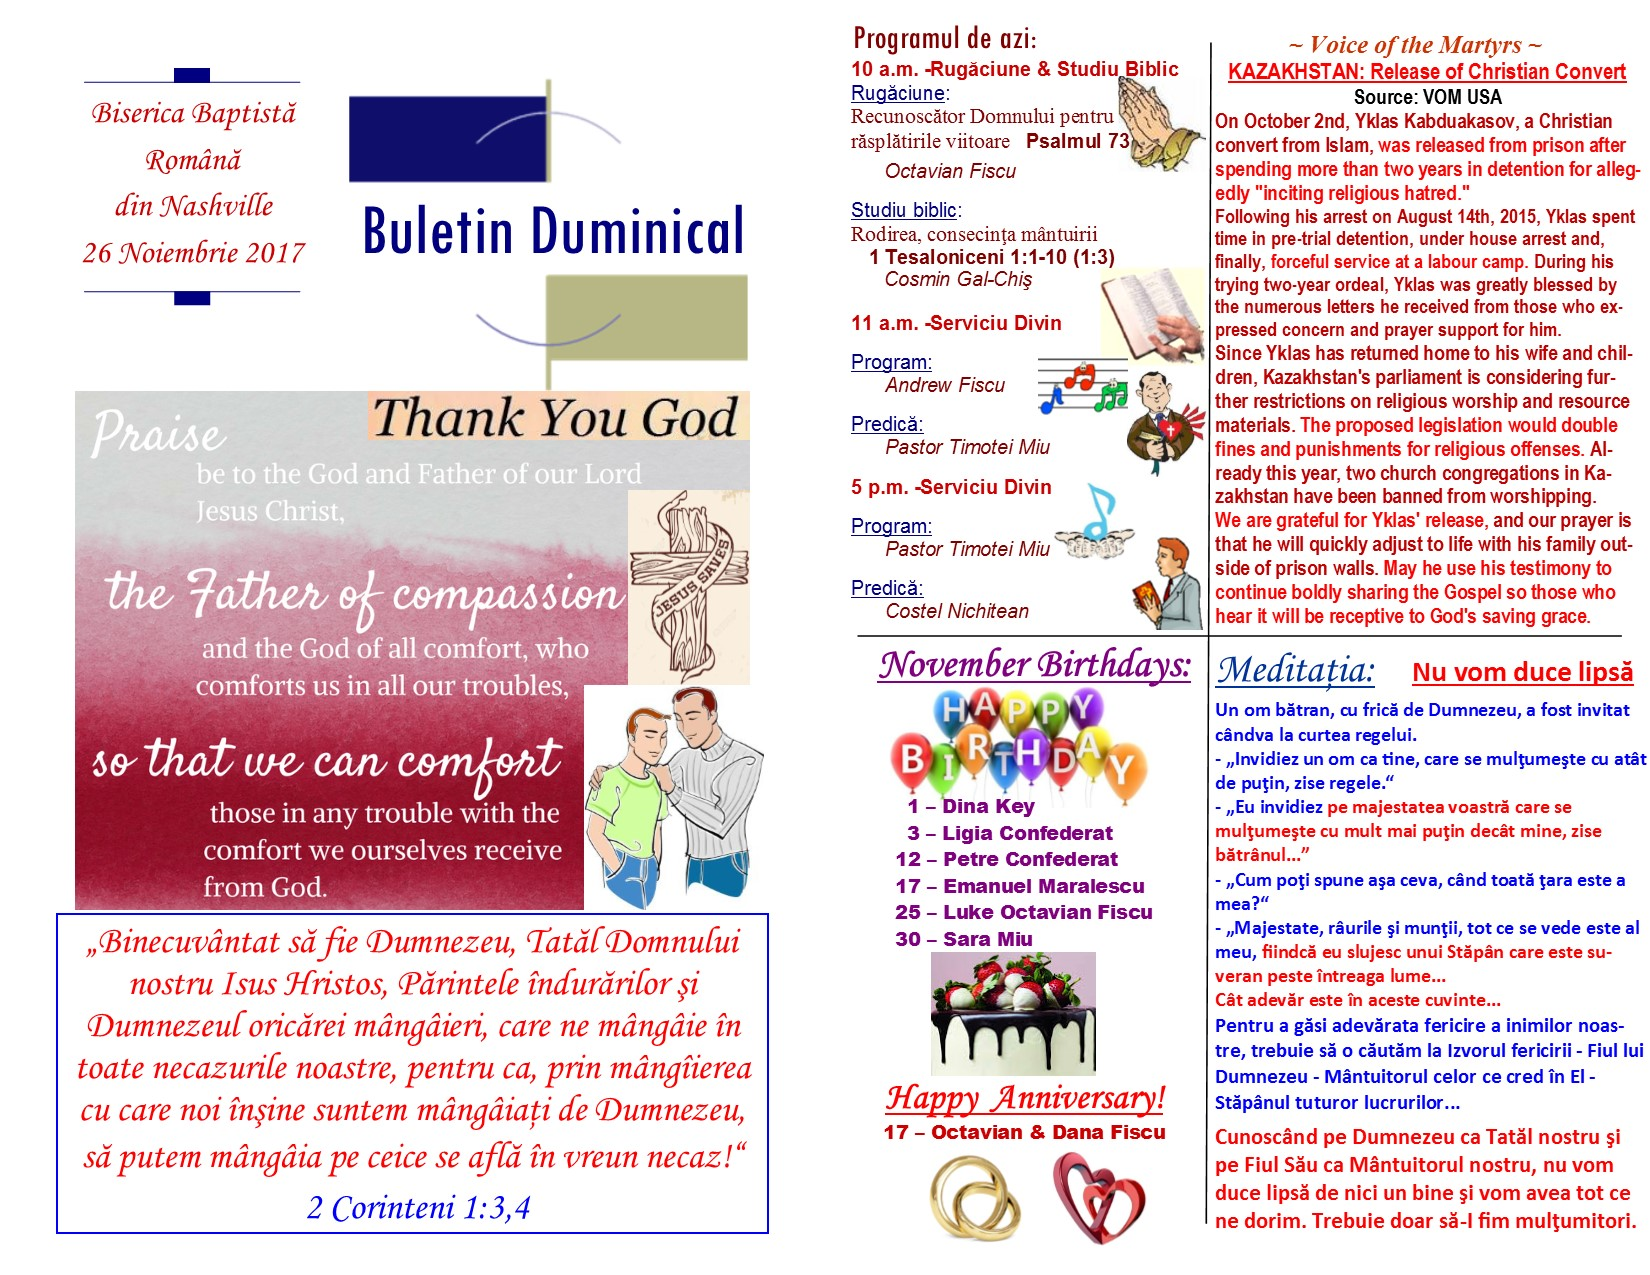 Buletin 11-26-17 page 1 & 2